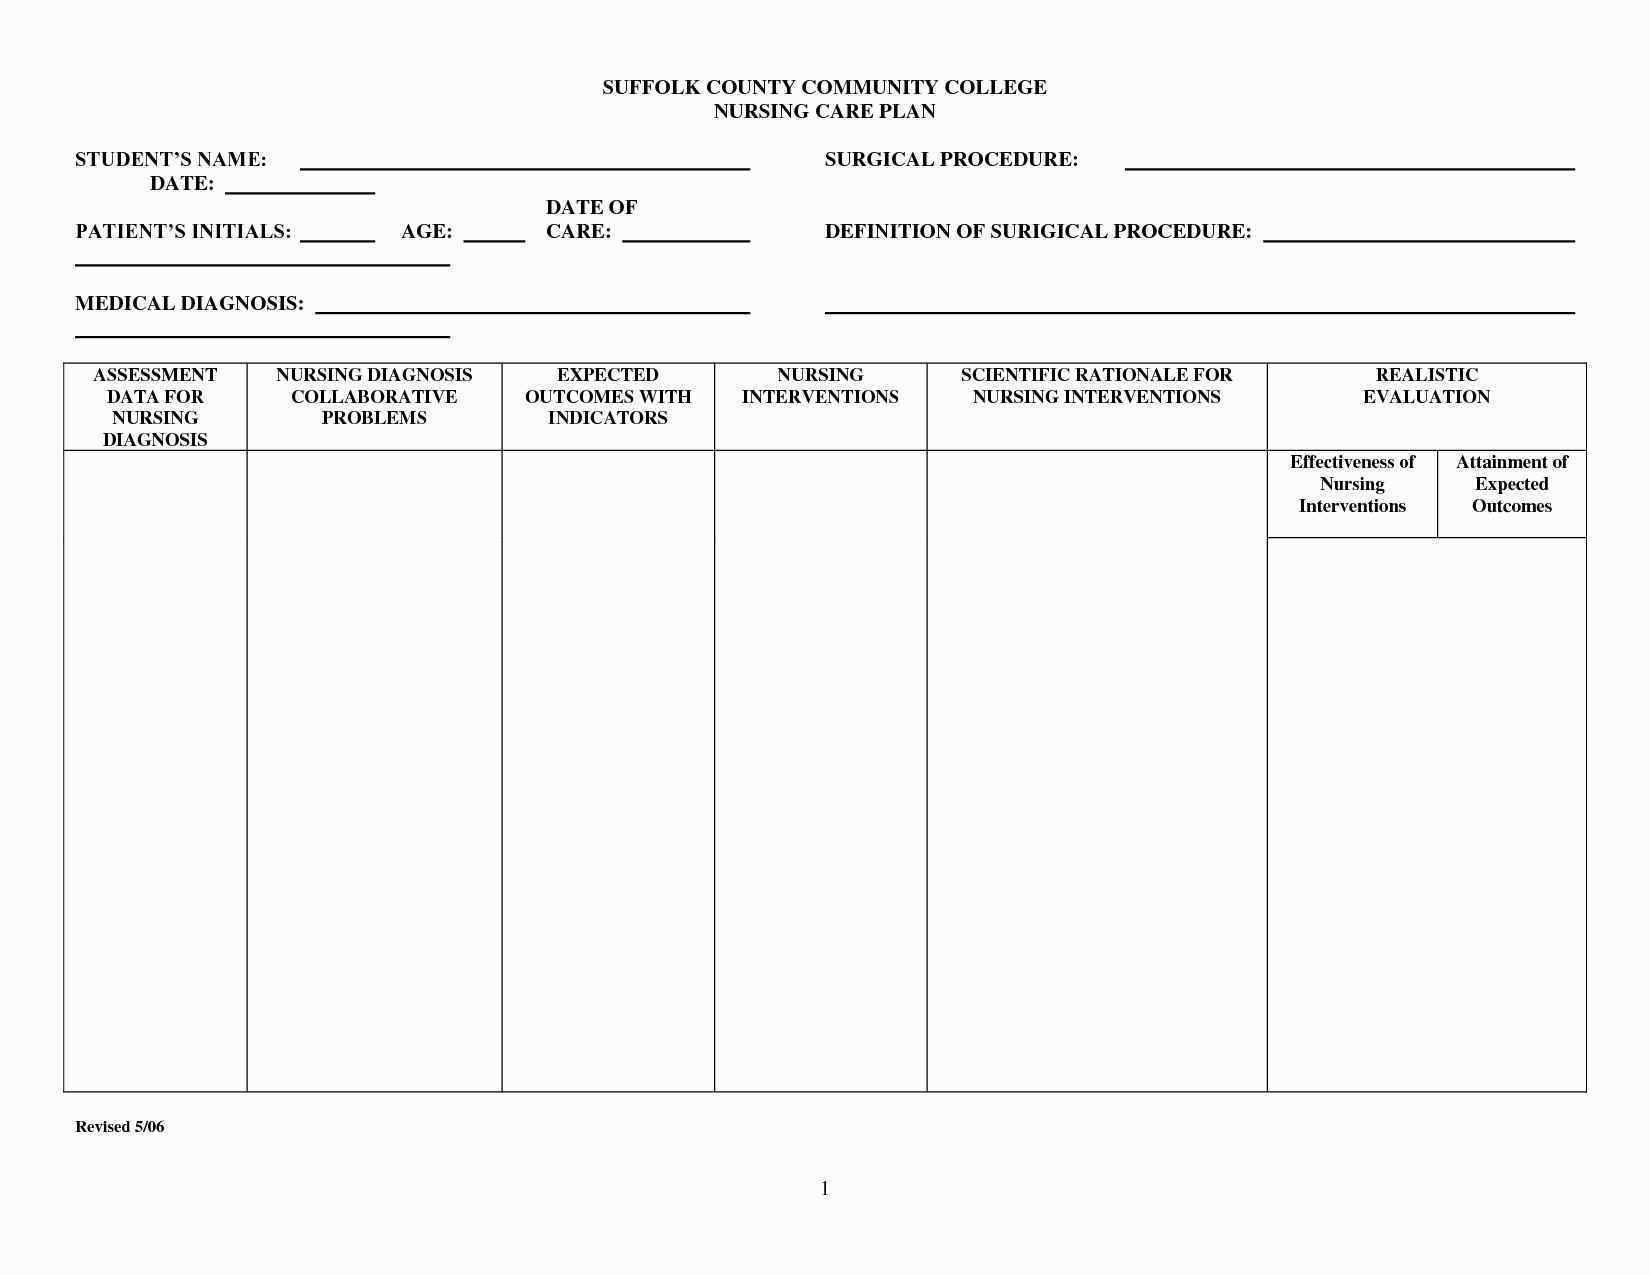 Hand Off Communication Worksheet